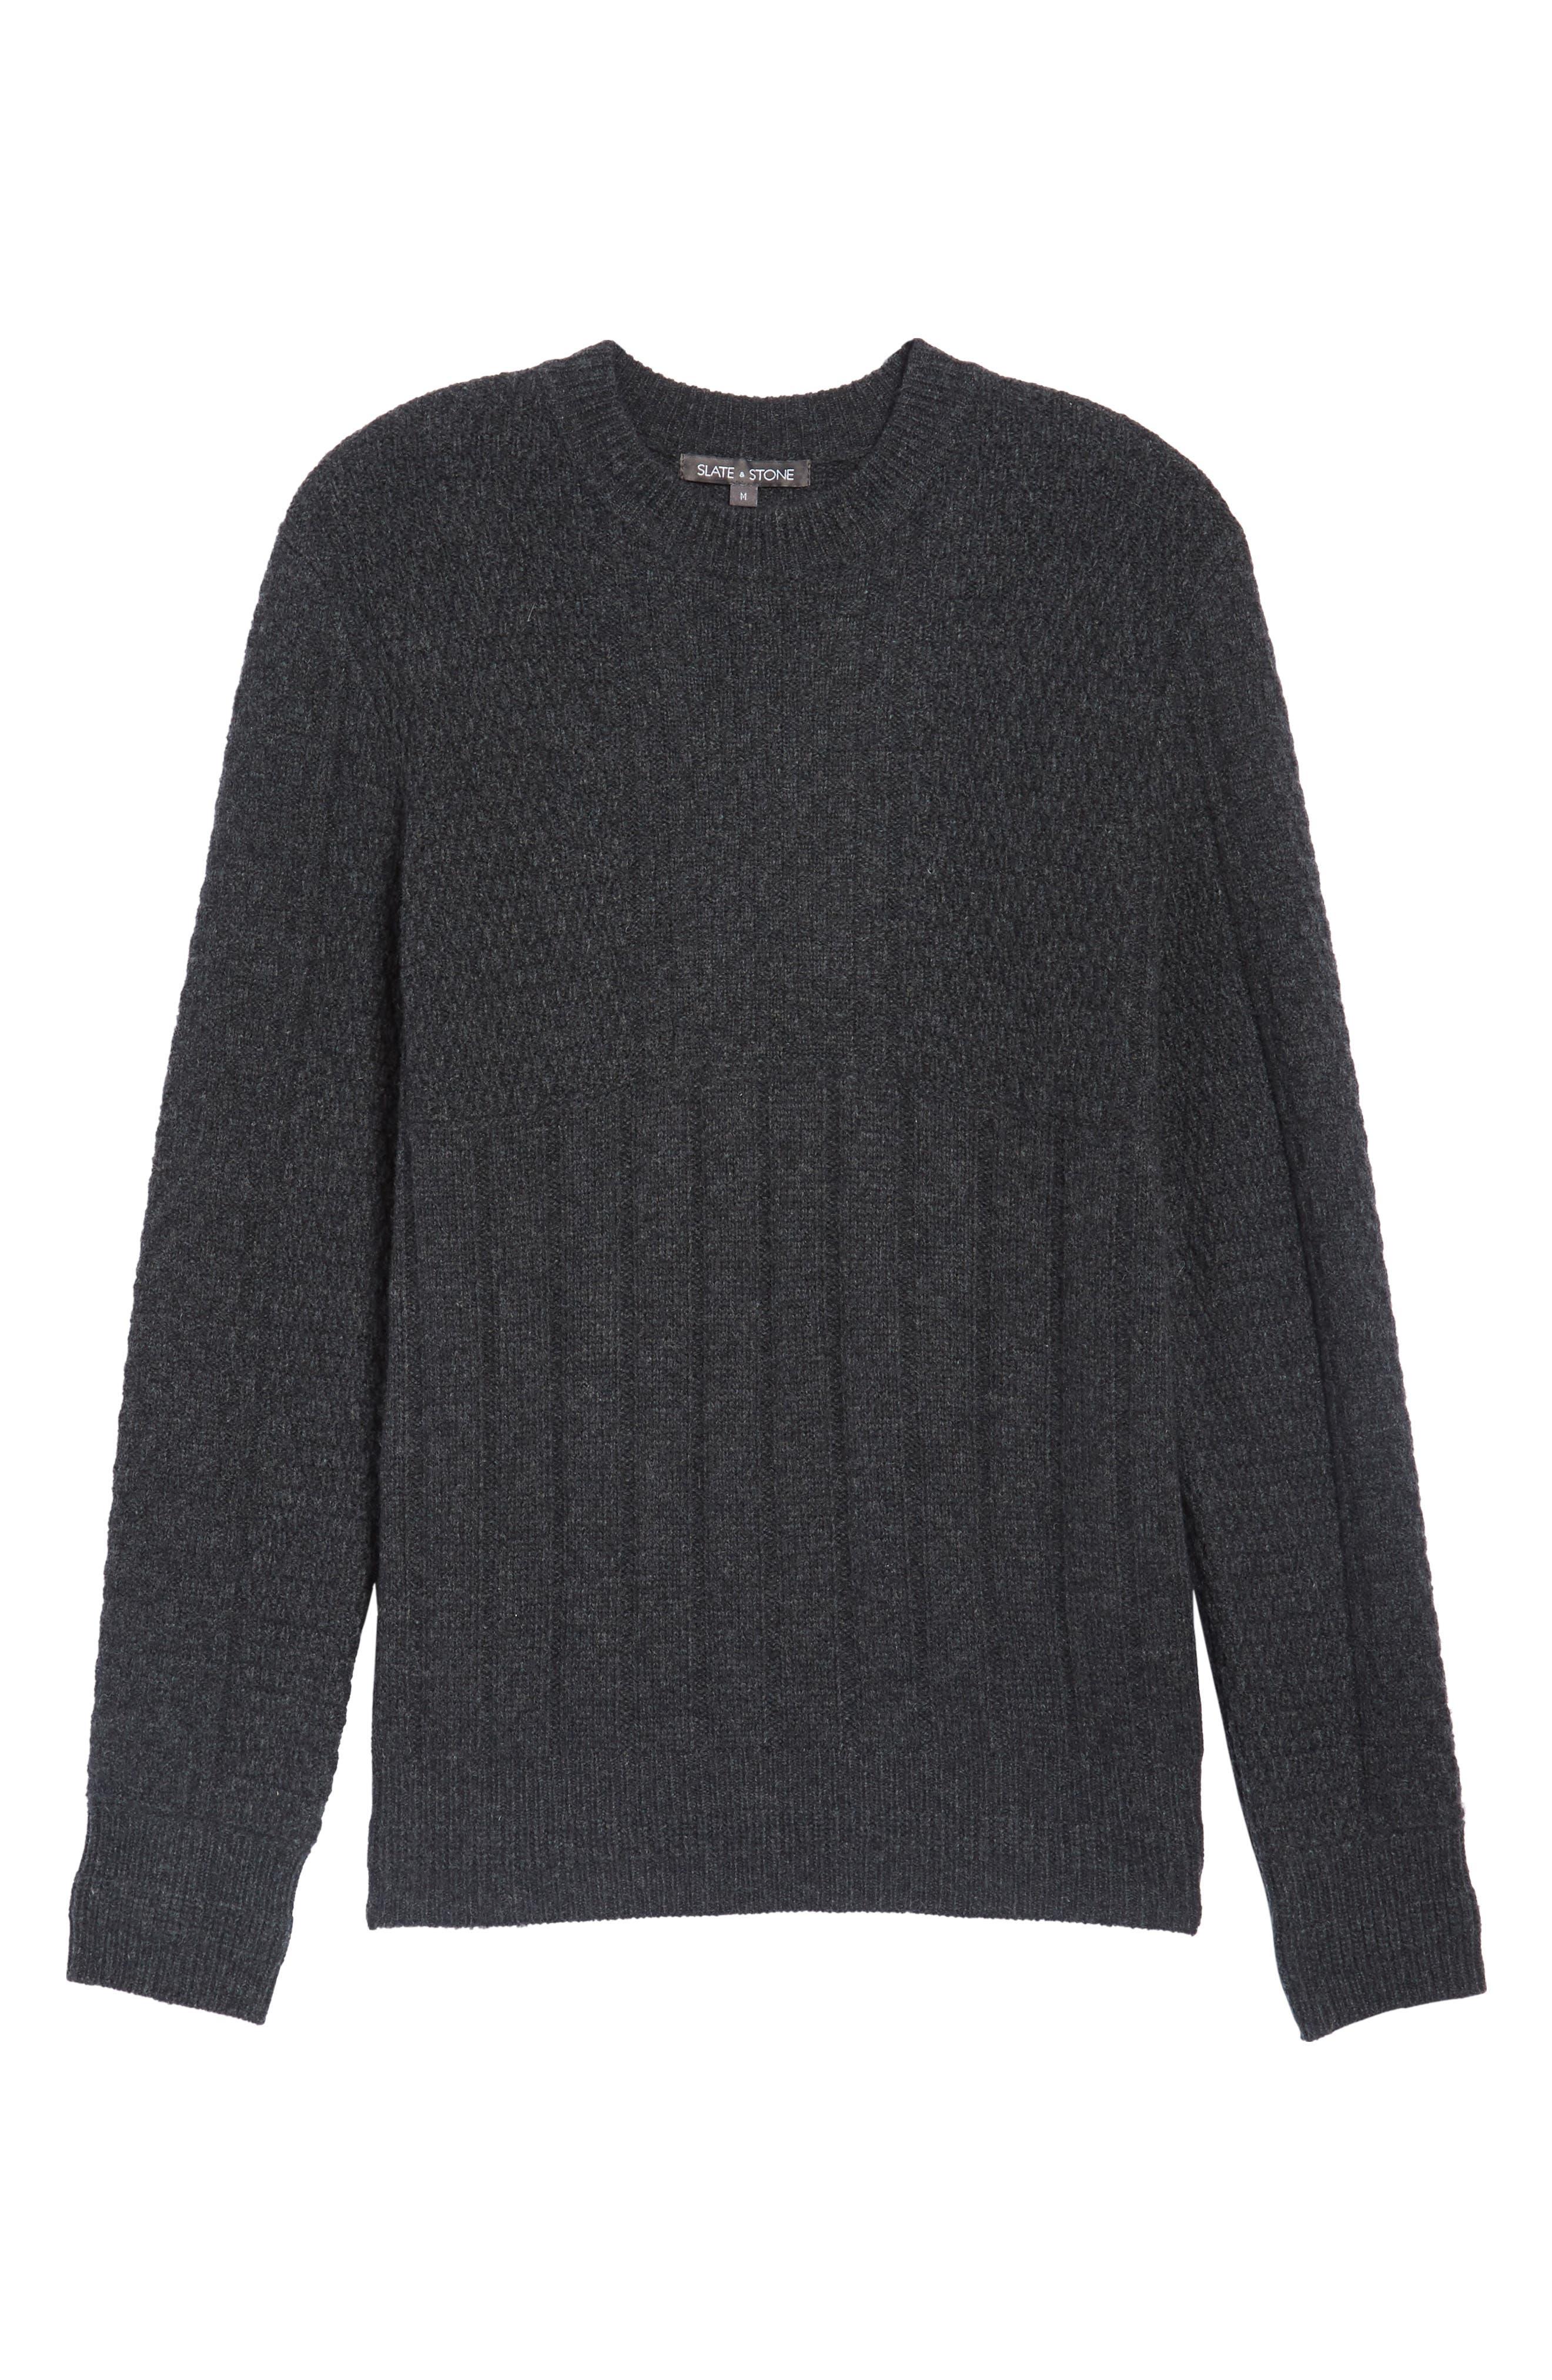 Wool Crewneck Sweater,                             Alternate thumbnail 6, color,                             020